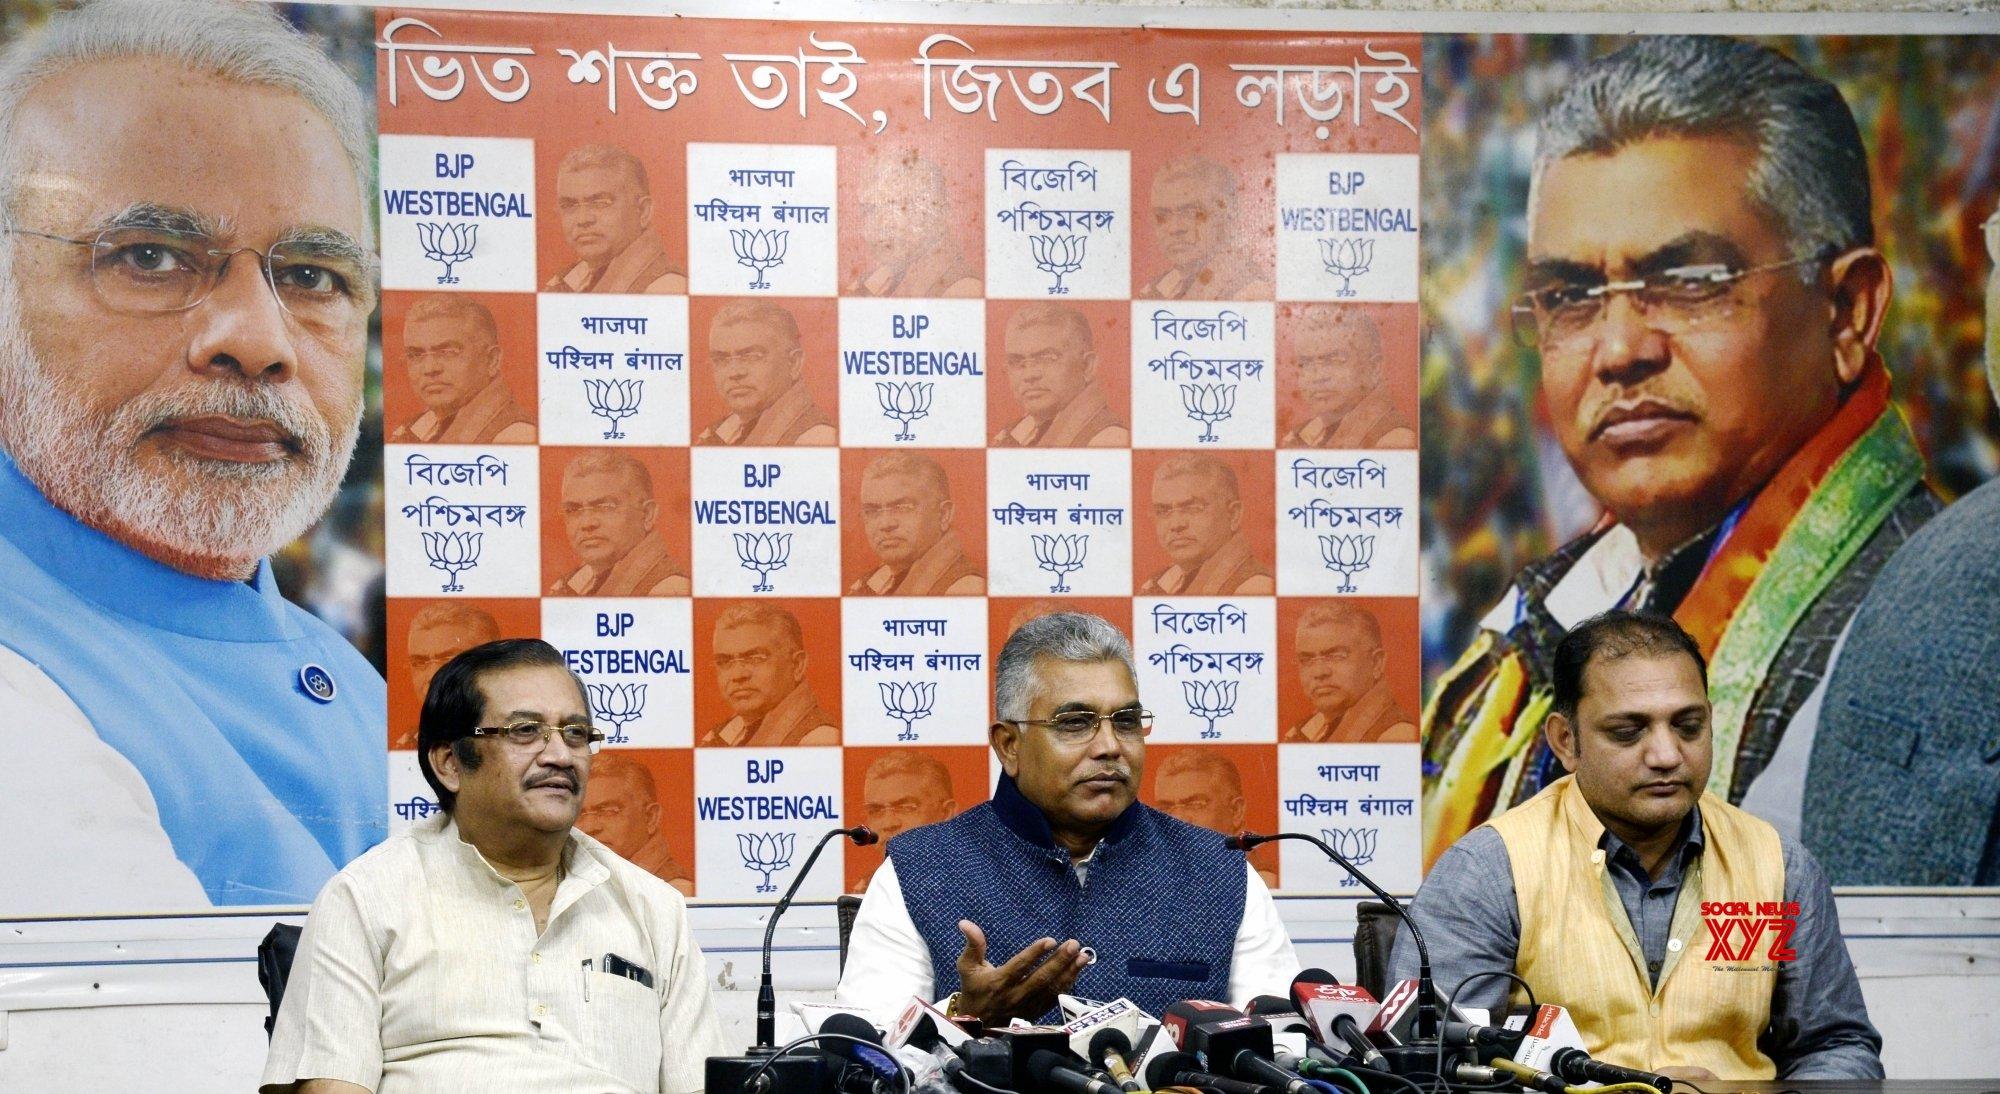 Kolkata: Dilip Ghosh's press conference #Gallery